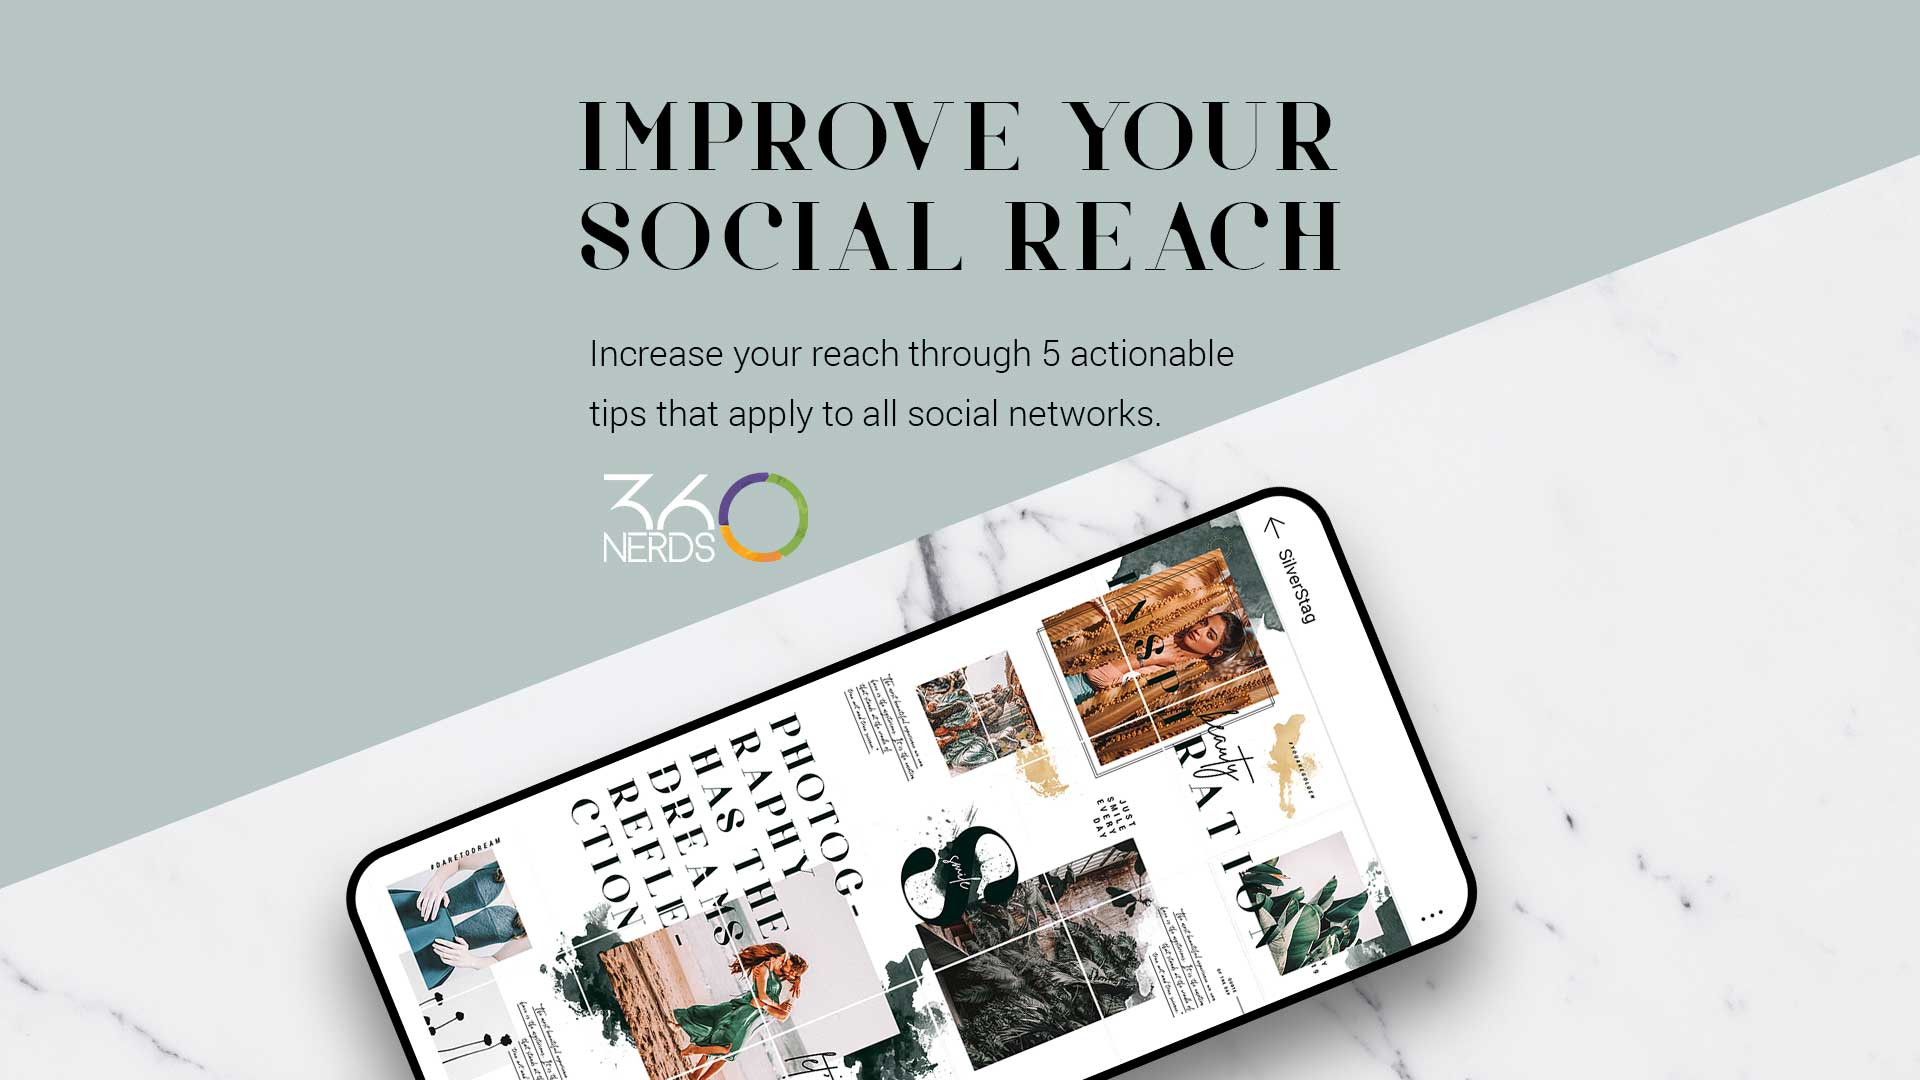 Improve-Your-Social-Reach-Digital-Marketing-Company-X